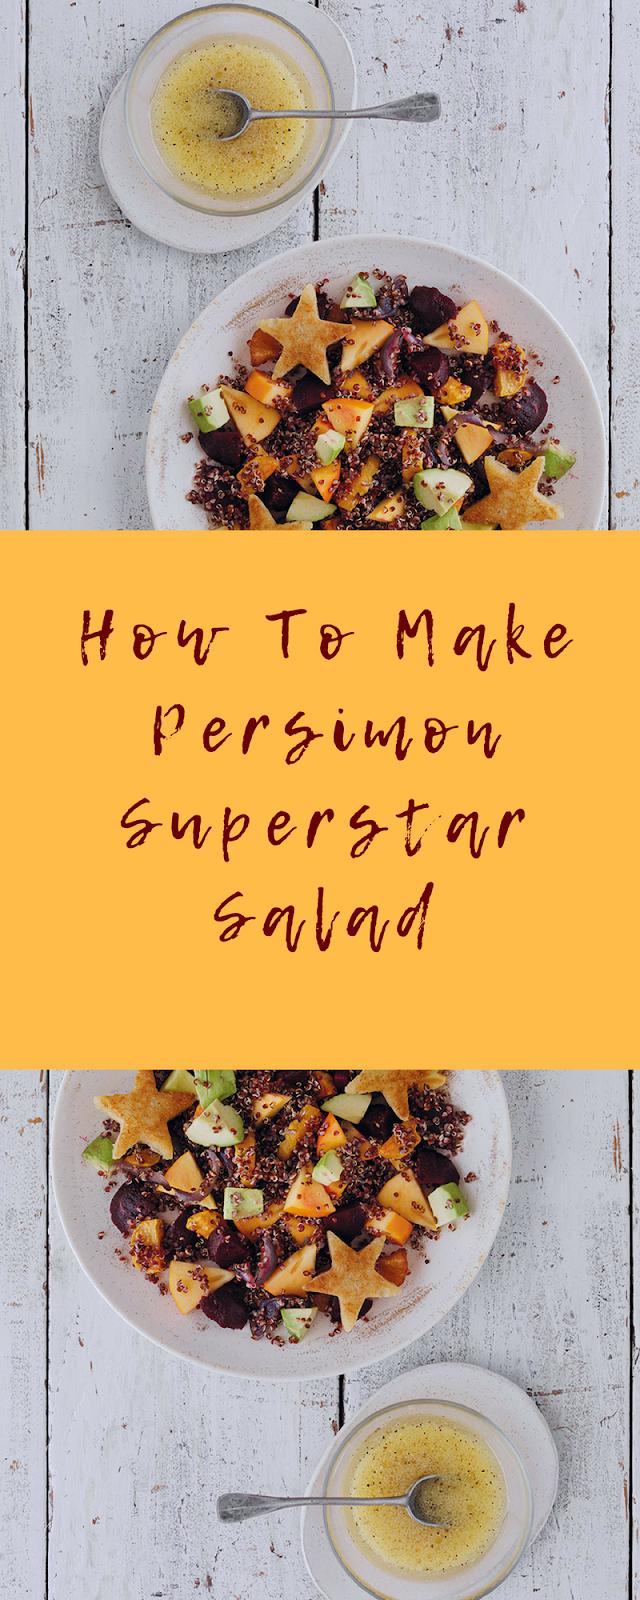 Persimon Superstar Salad